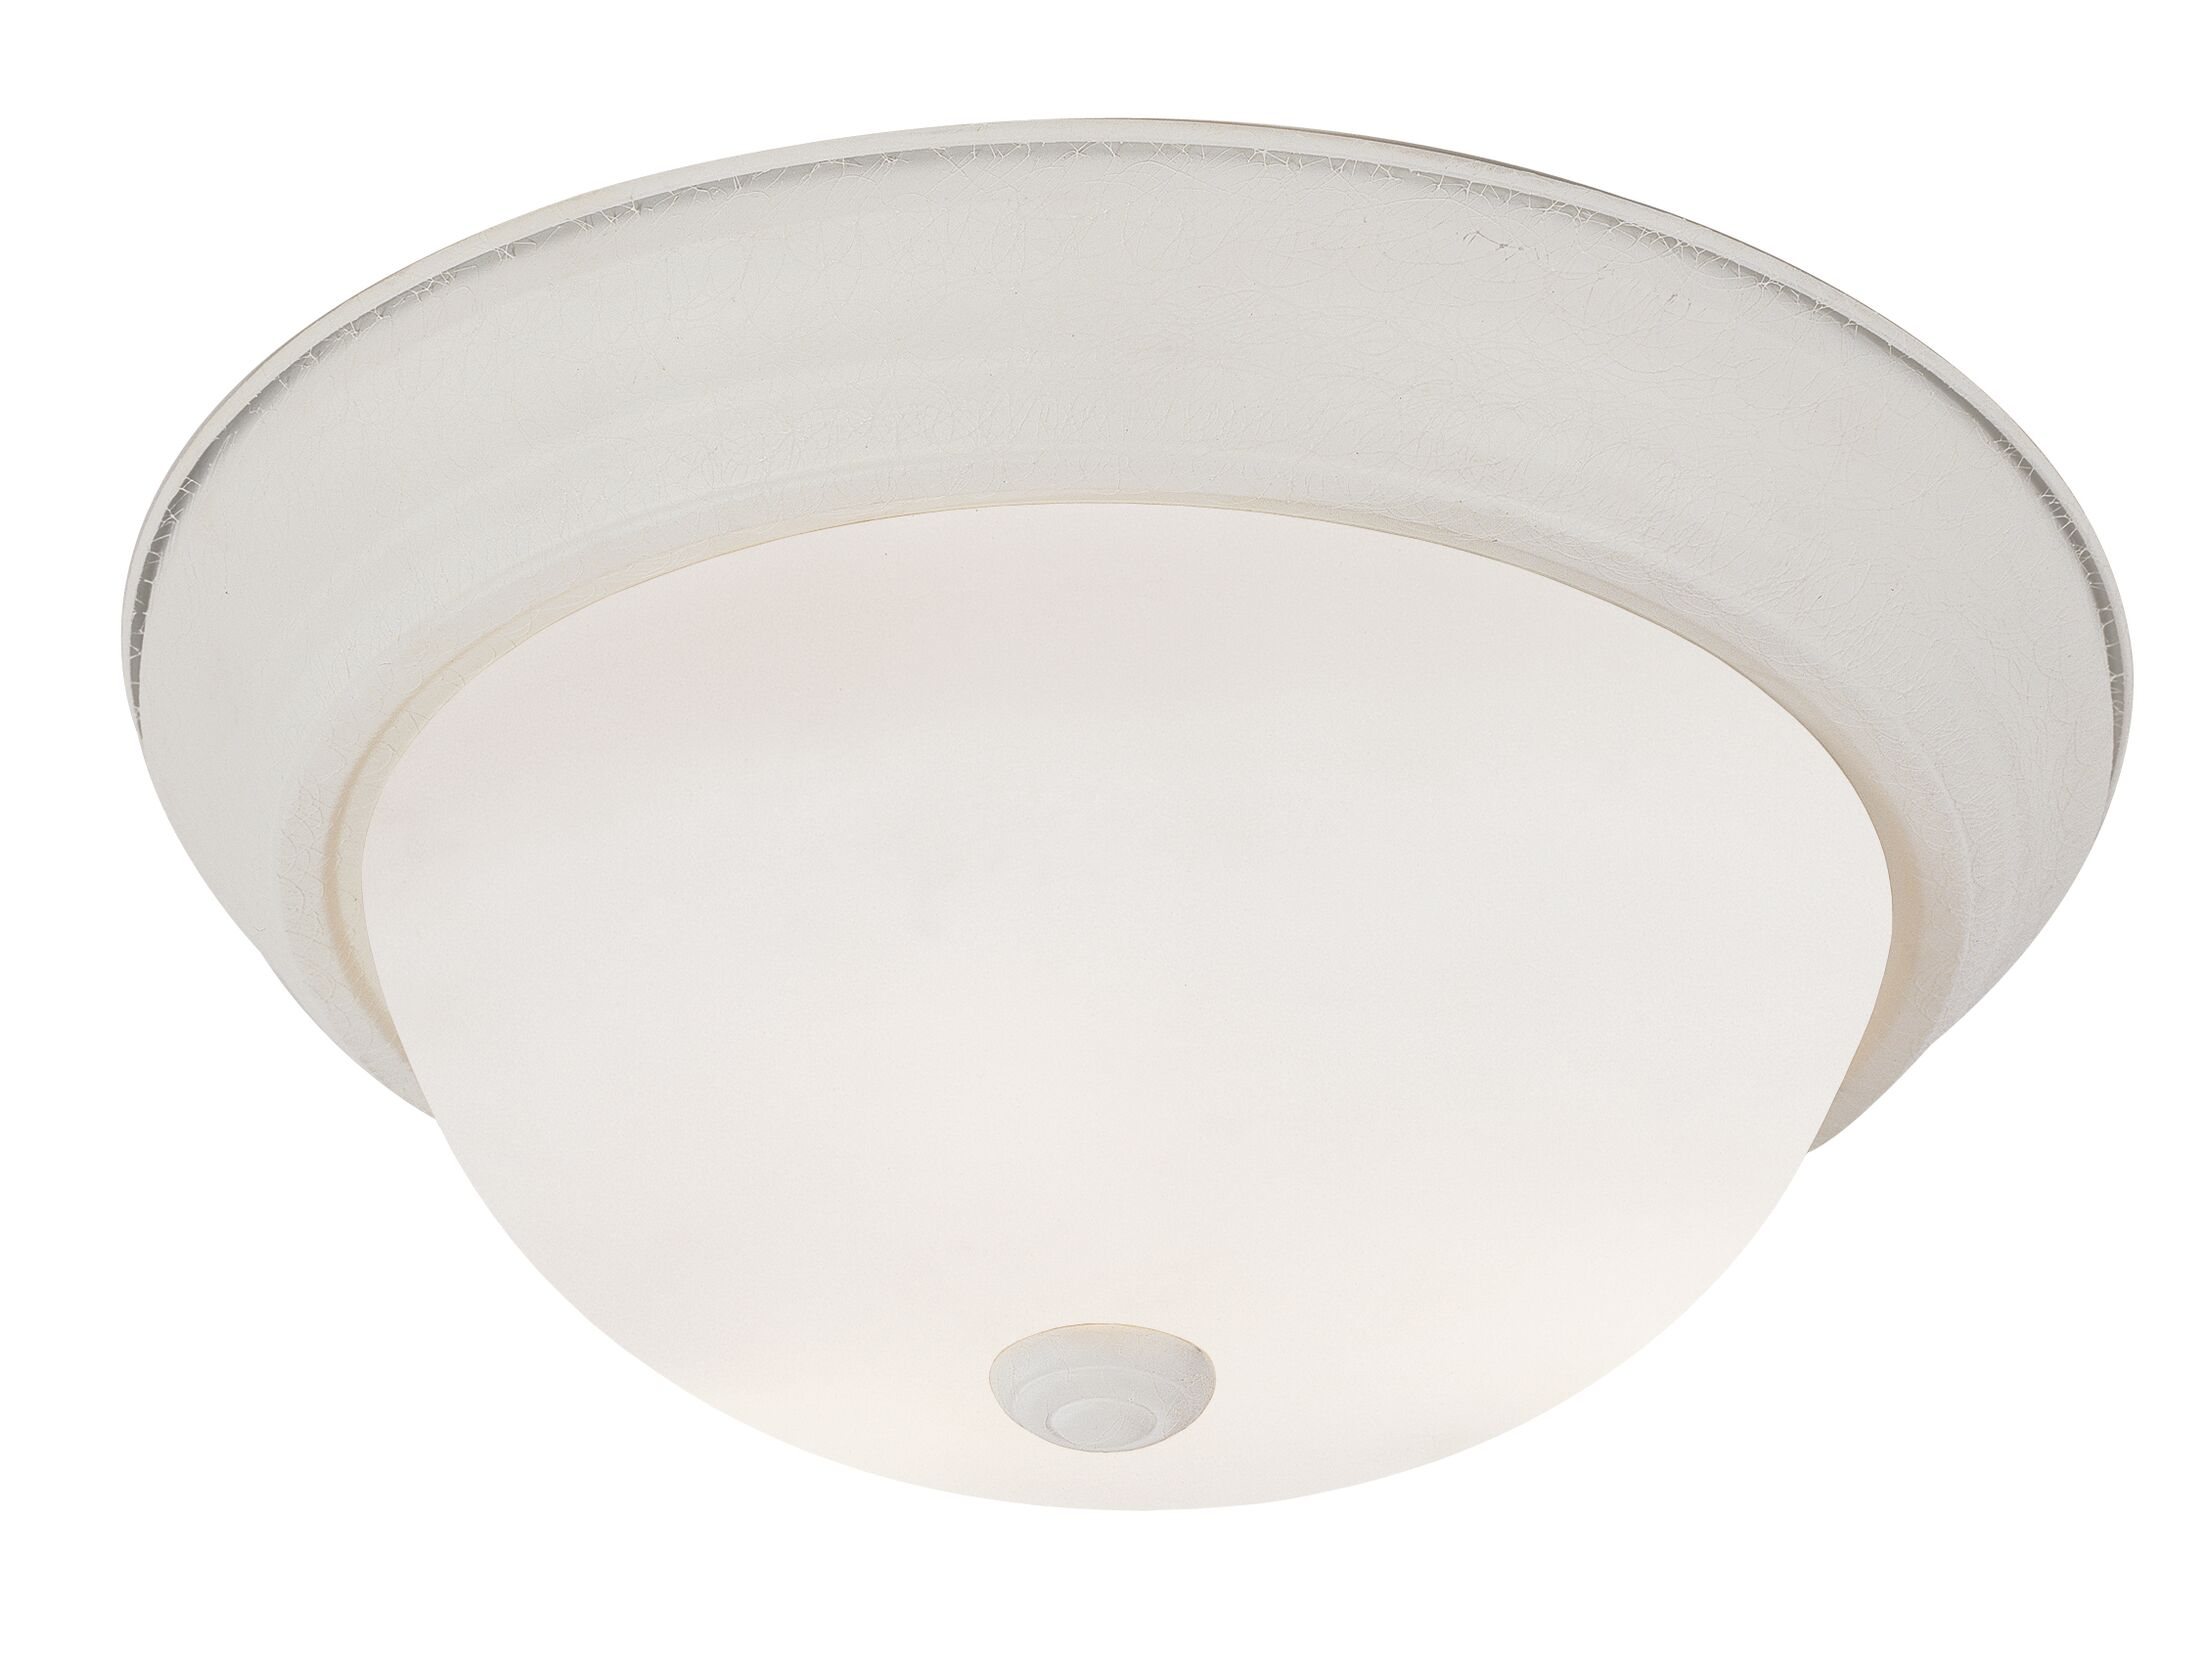 Elwin 1-Light LED Flush Mount Fixture Finish: Antique White, Size: 6